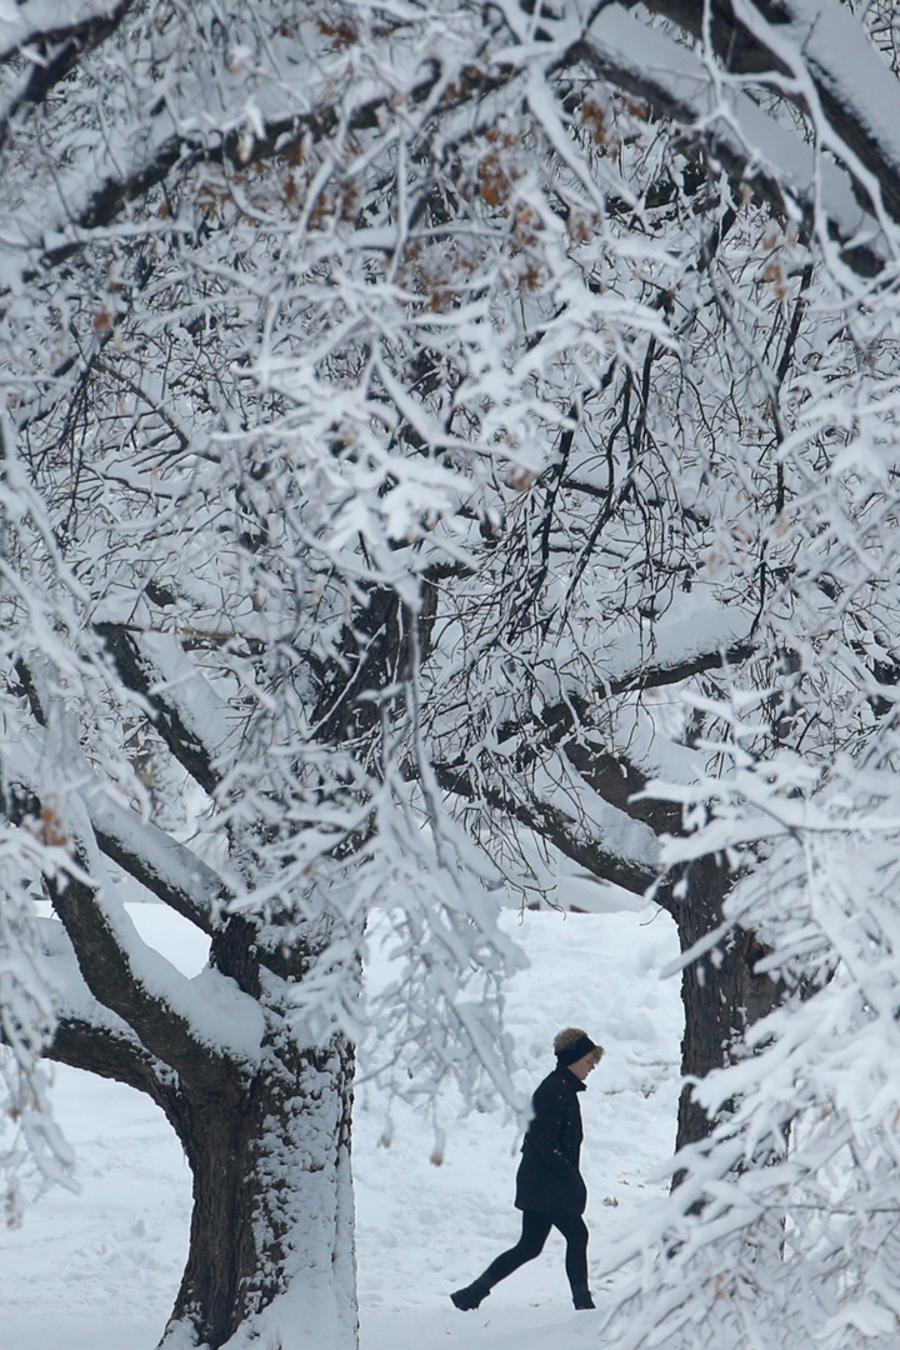 Tormenta de nieve azota a EEUU en una imagen de archivo